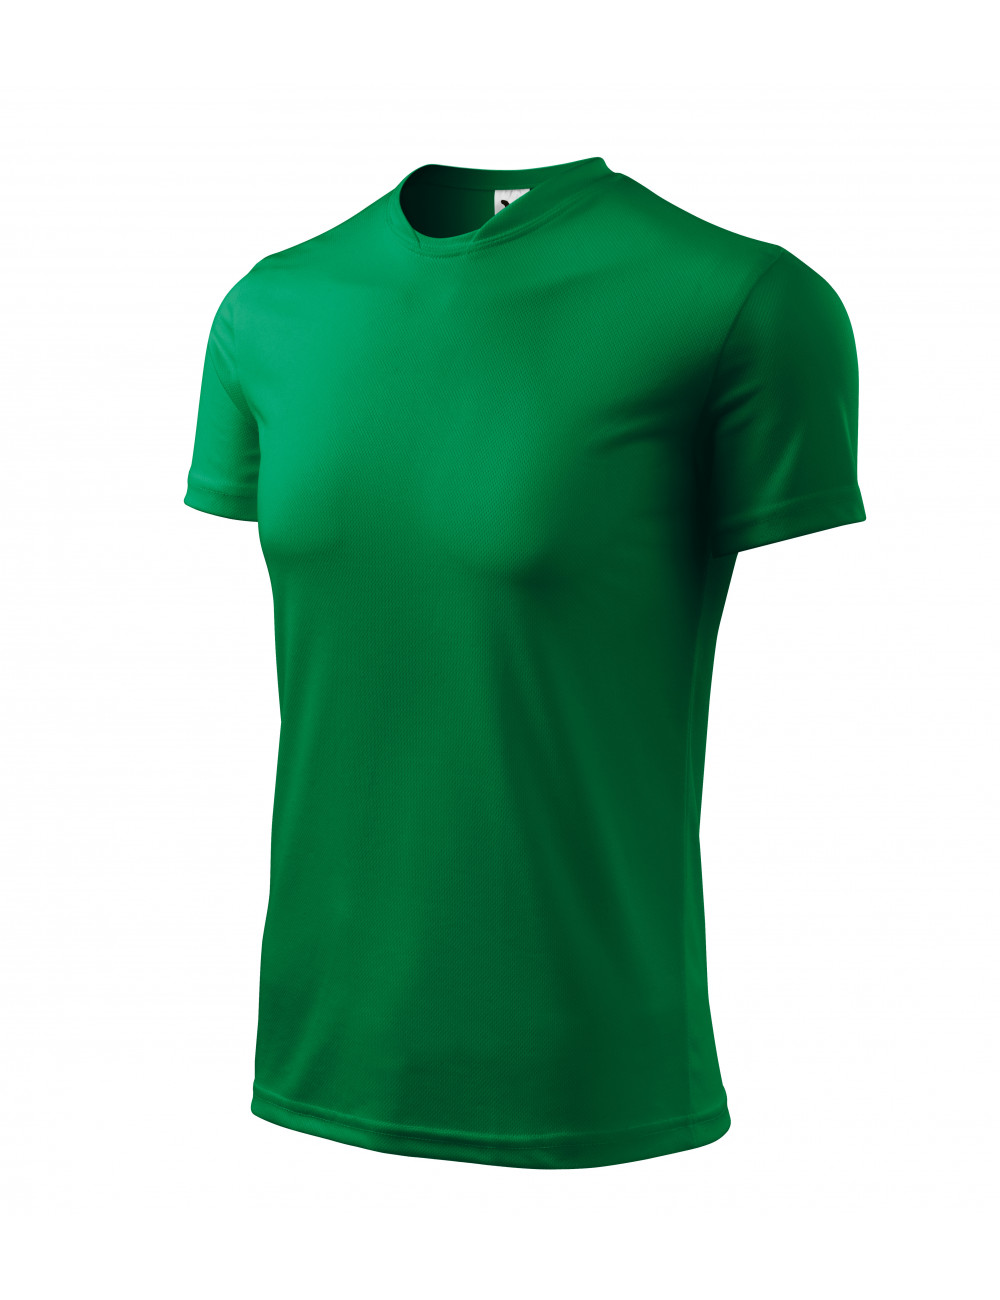 Adler MALFINI Koszulka męska Fantasy 124 zieleń trawy